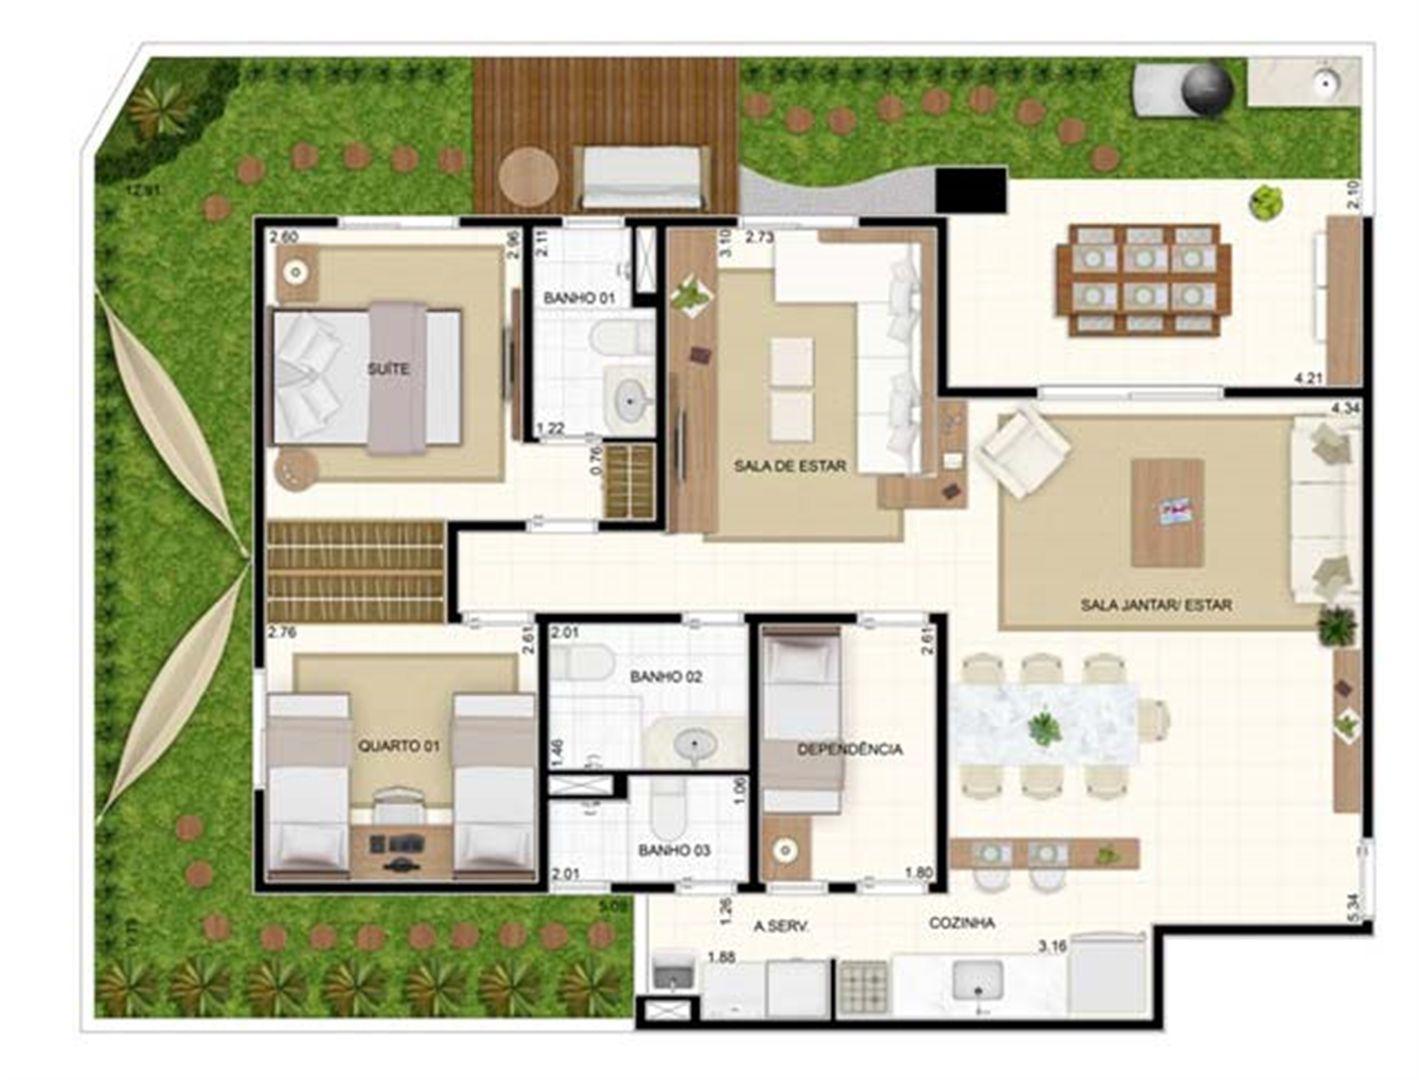 Giardino 3 dorms Sala Ampliada 129,10m²   Vita 2 Residencial Clube – Apartamento no  Pitimbu - Natal - Rio Grande do Norte